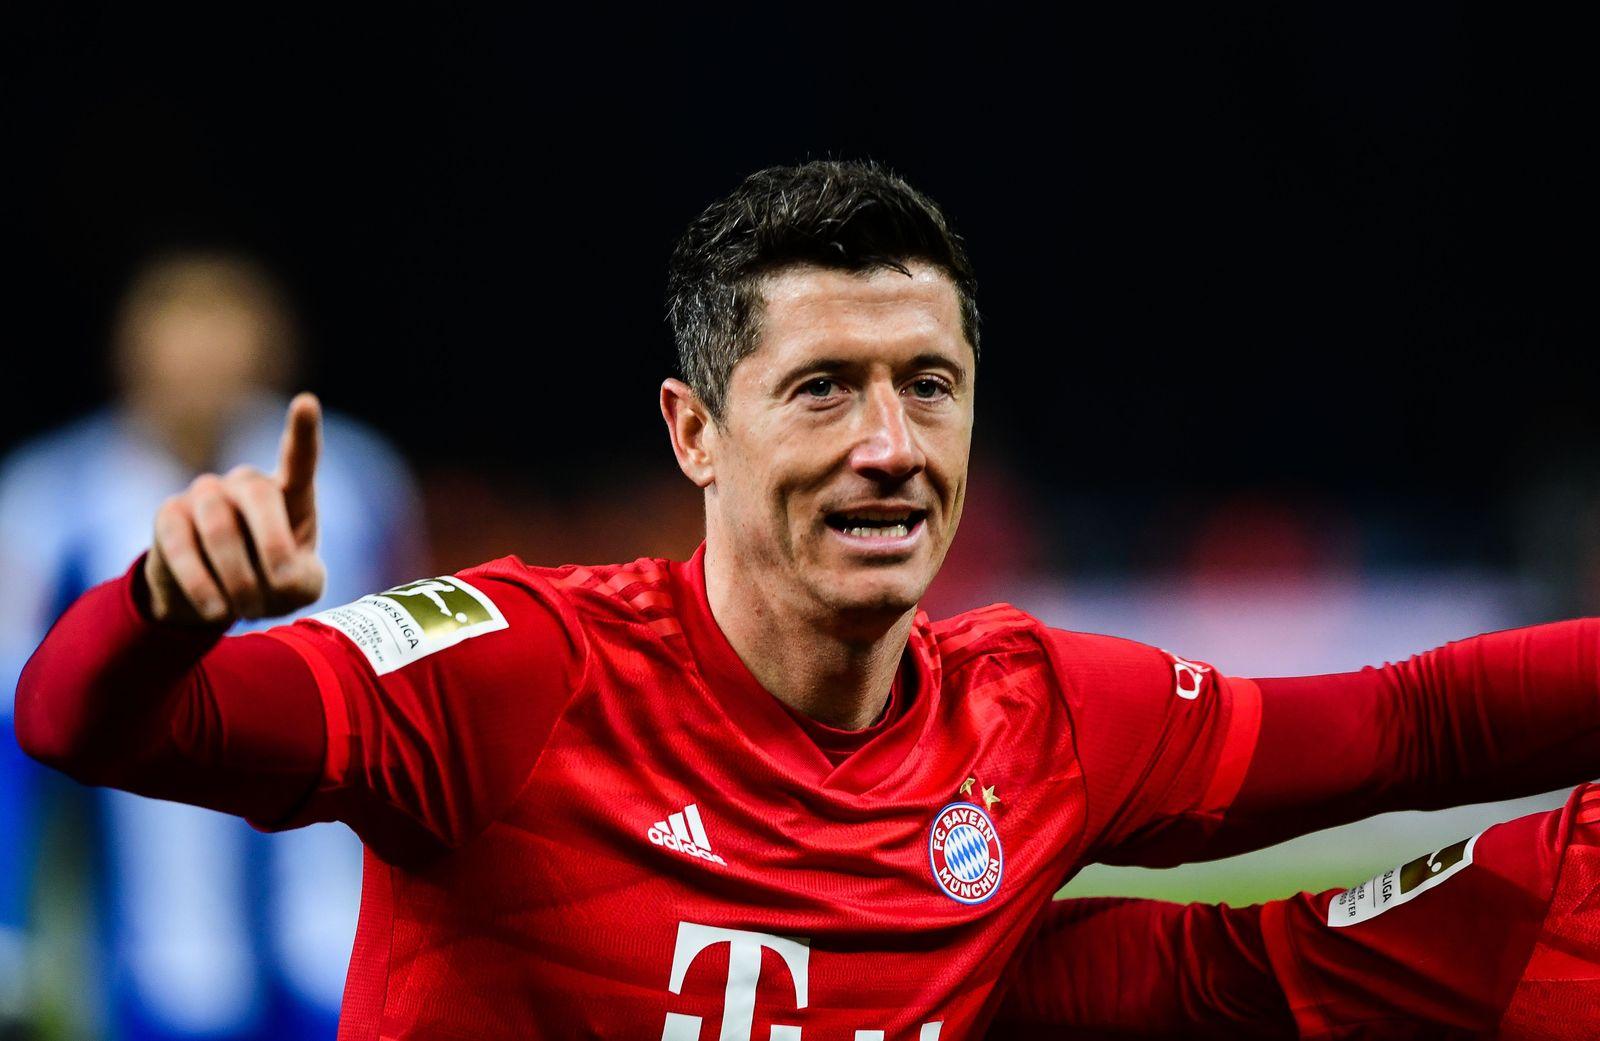 Hertha BSC vs FC Bayern Munich, Berlin, Germany - 19 Jan 2020